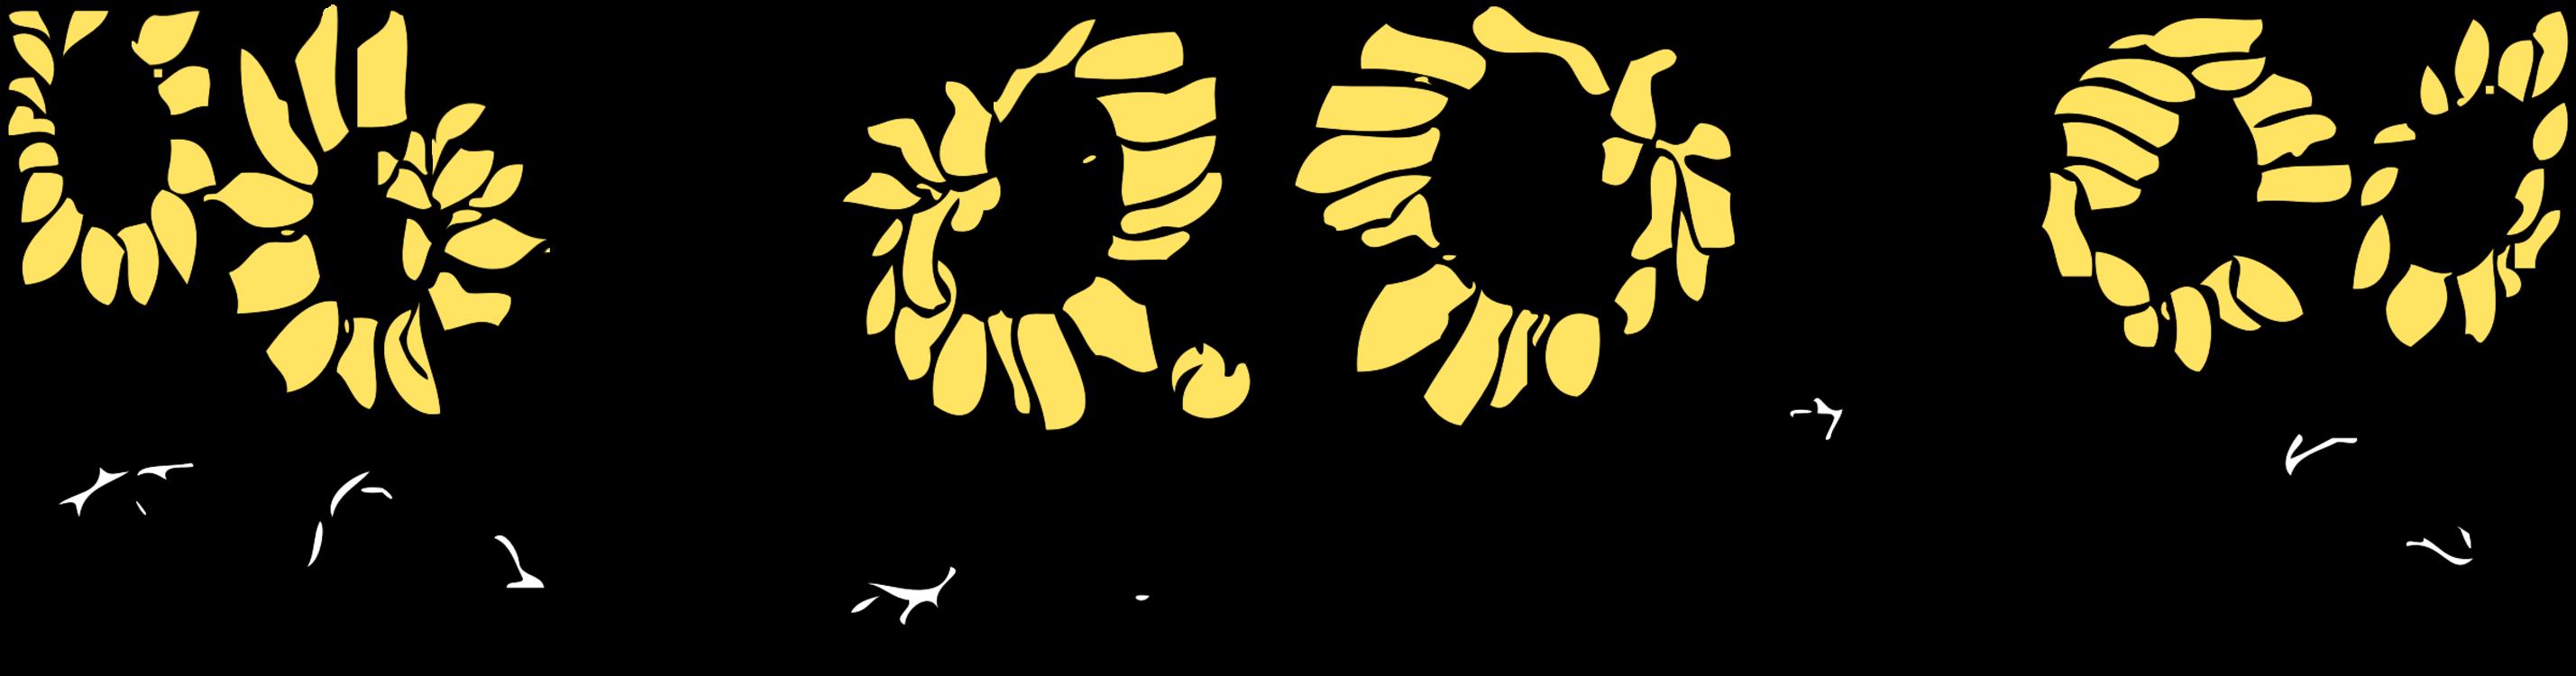 Art,Grass Family,Yellow